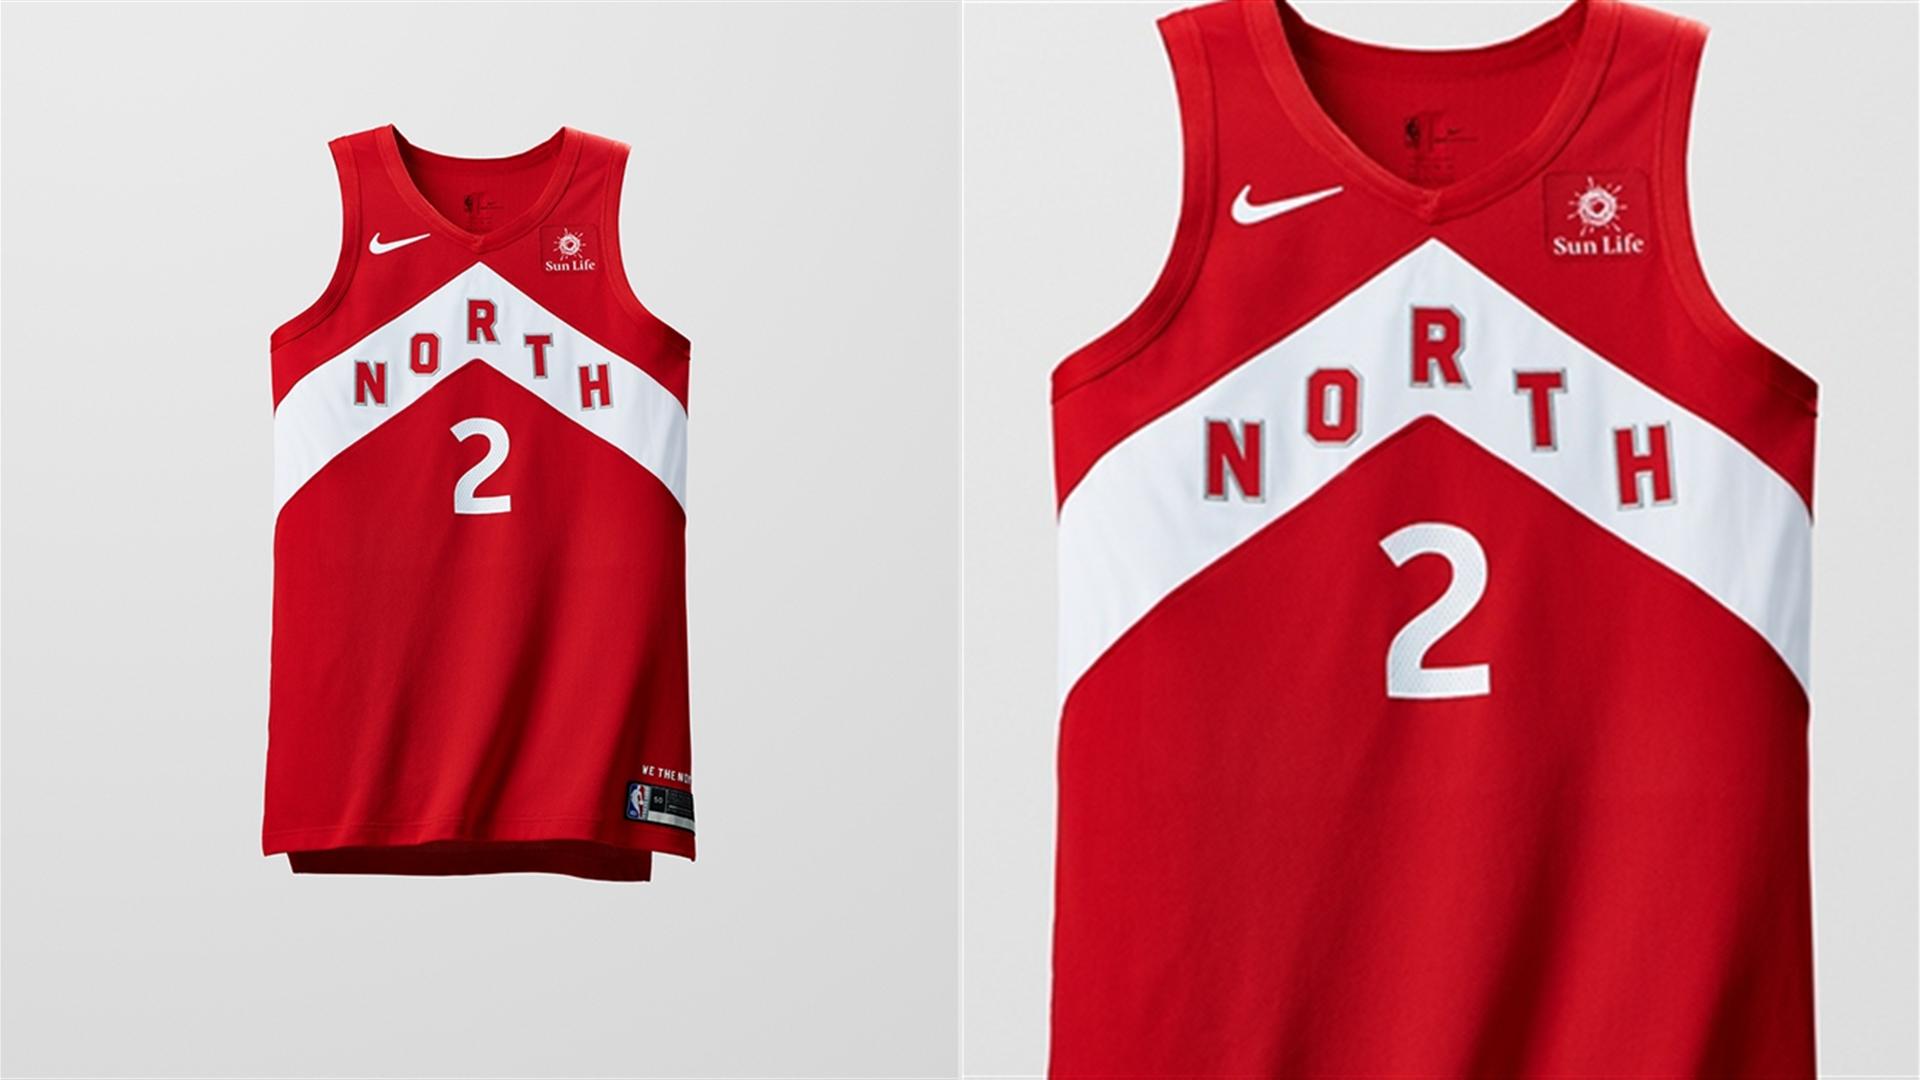 sale retailer 5feff 57174 Nike introduces NBA 'Earned' jerseys ahead of Christmas Day ...